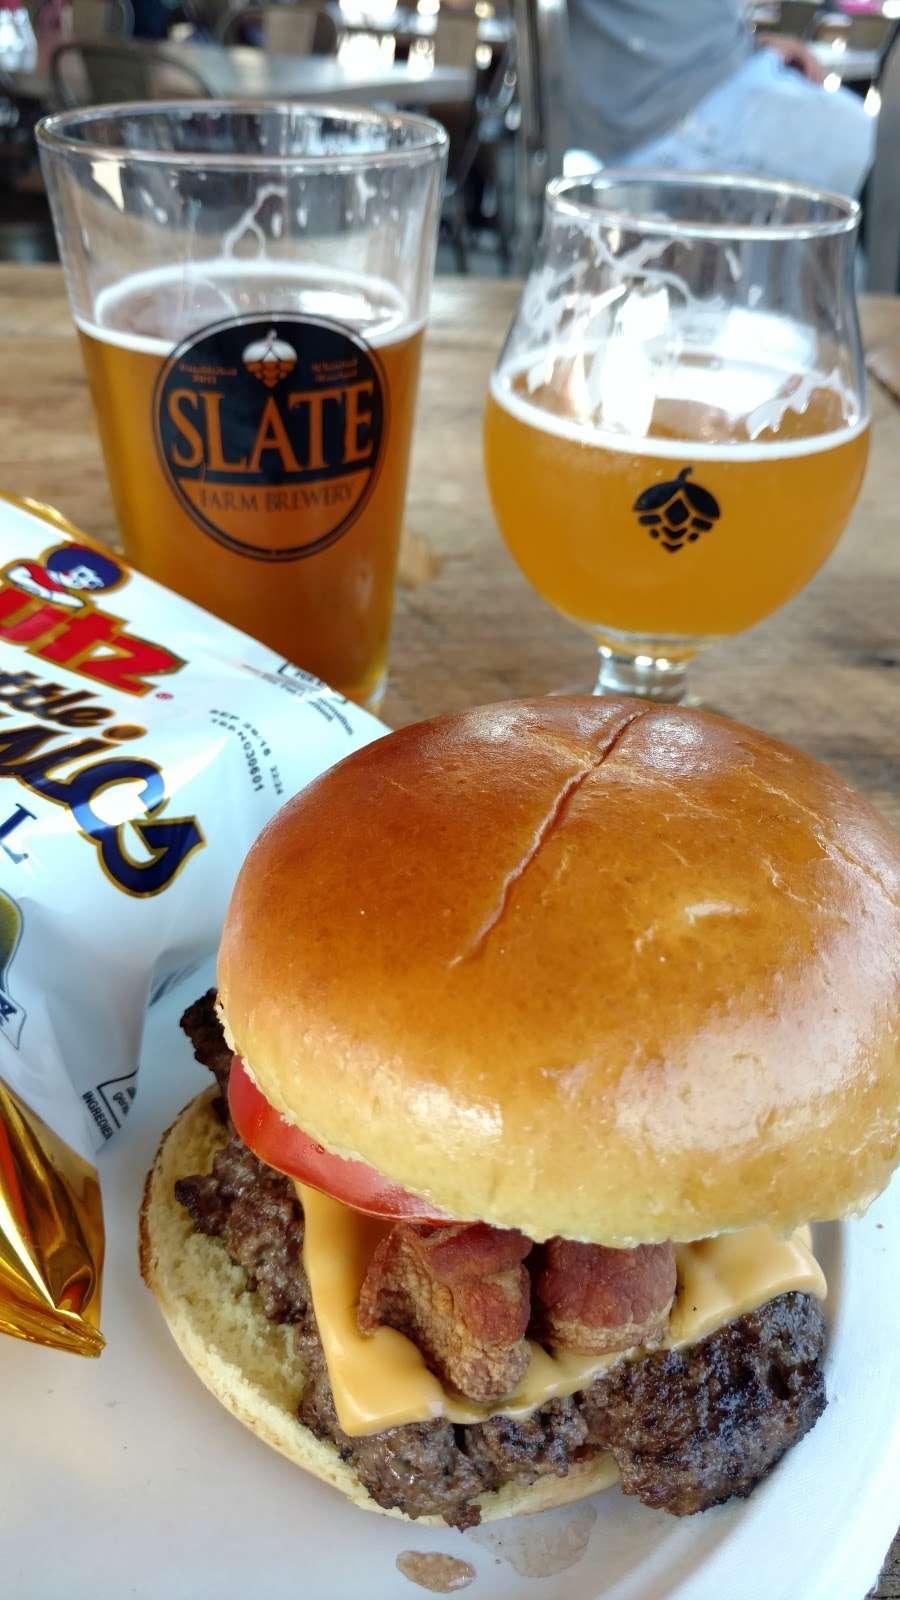 Slate Farm Brewery - restaurant  | Photo 7 of 10 | Address: 2128 Whiteford Rd, Whiteford, MD 21160, USA | Phone: (443) 528-7443